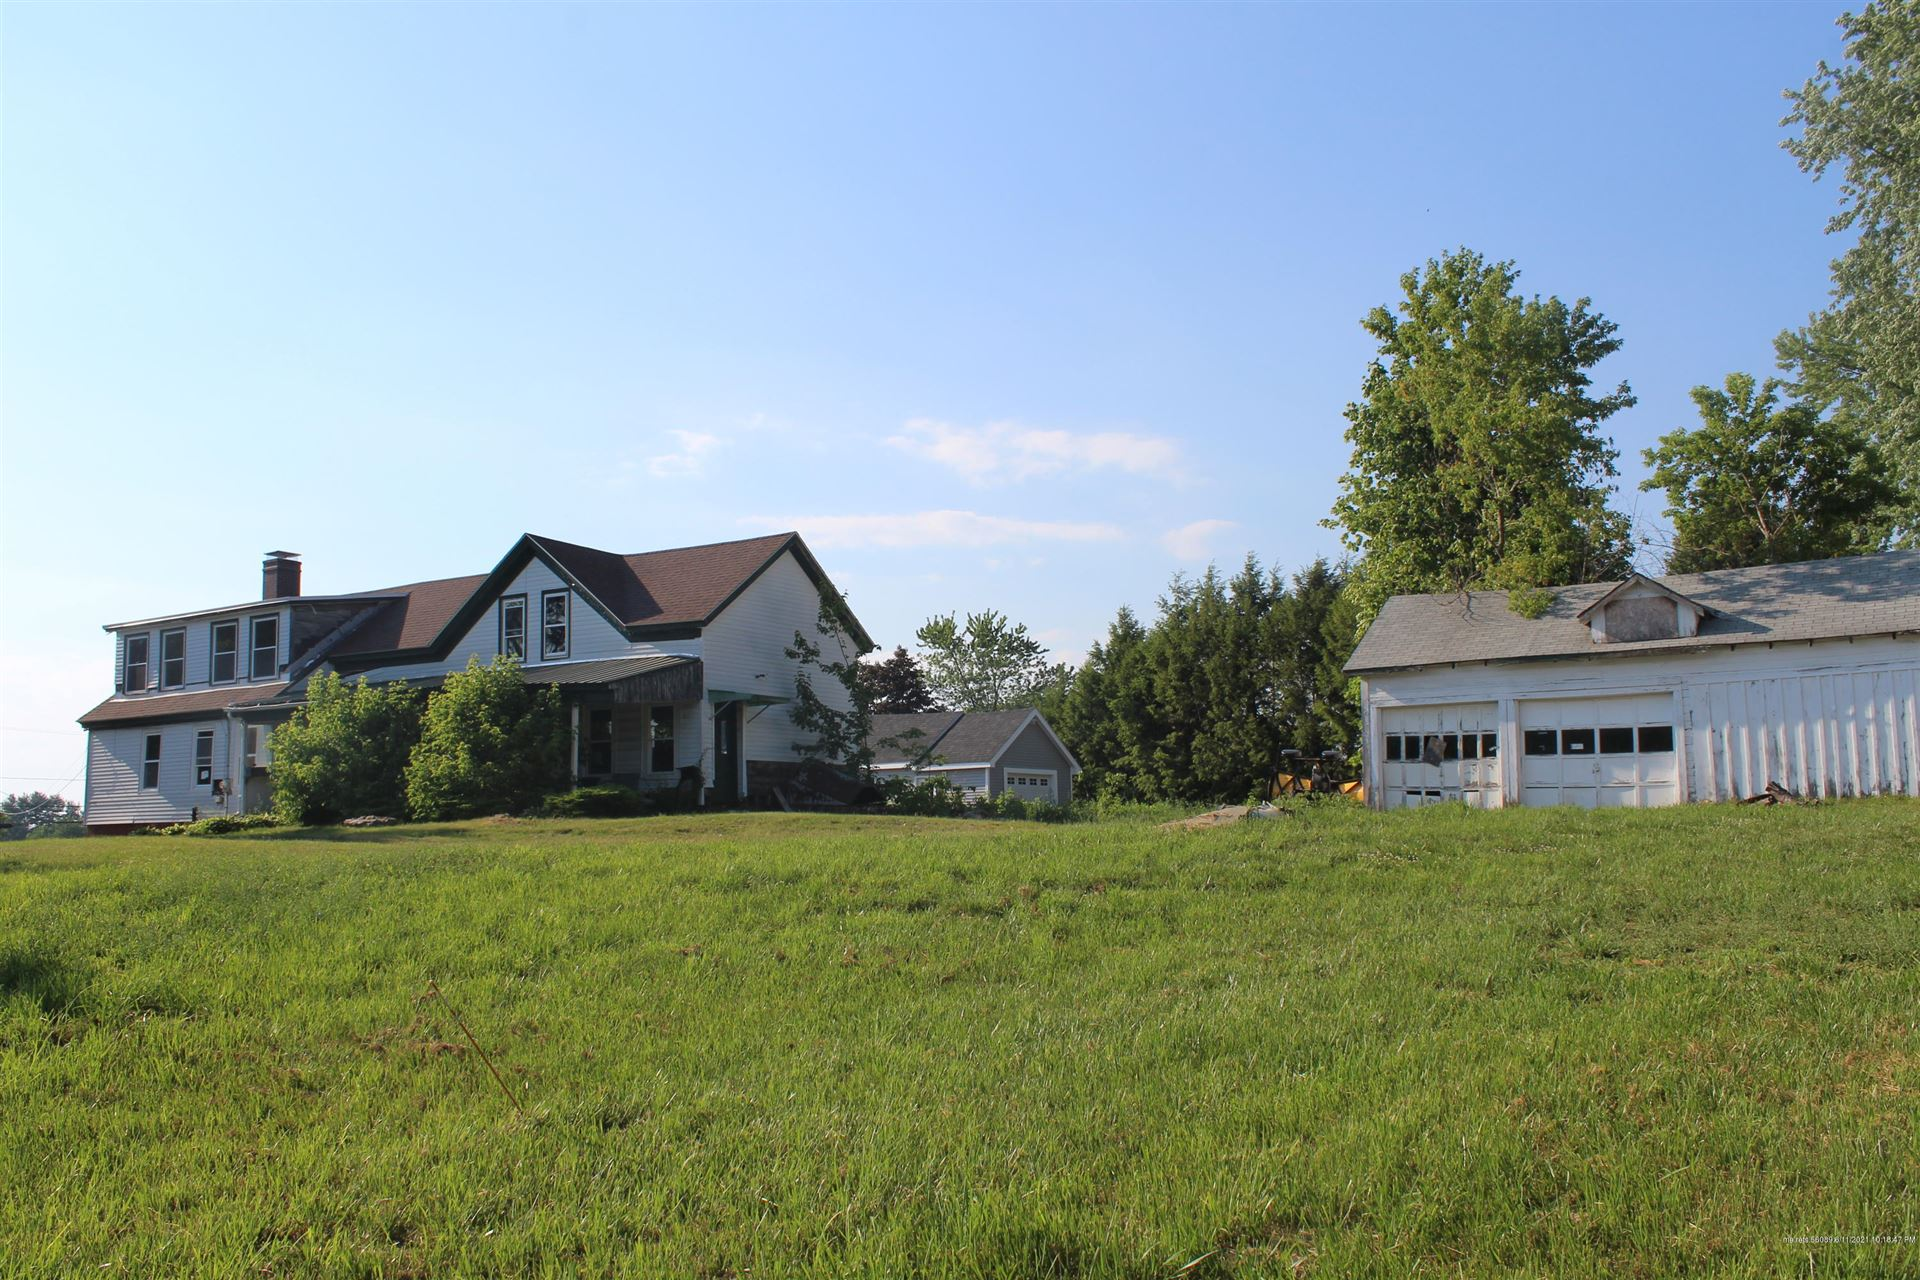 Photo of 365 East Avenue, Lewiston, ME 04240 (MLS # 1495976)